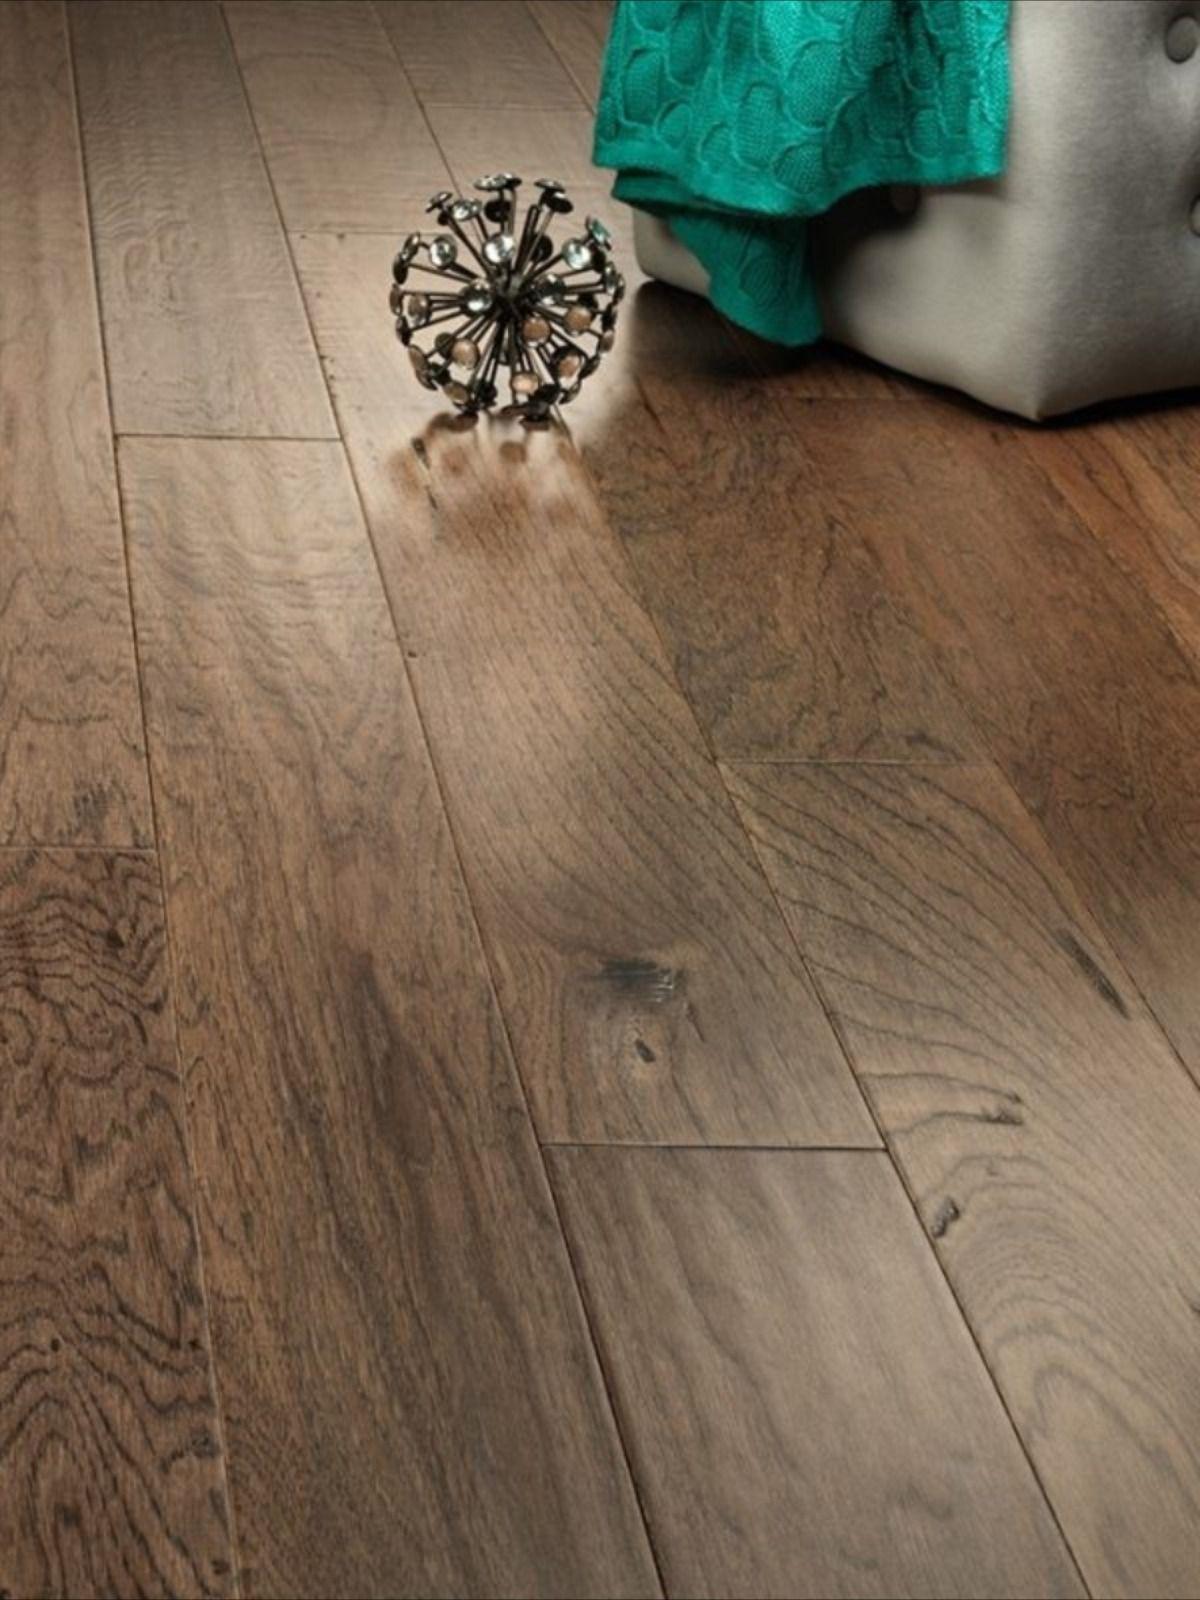 Pueblo prefinished engineered Hickory hardwood flooring